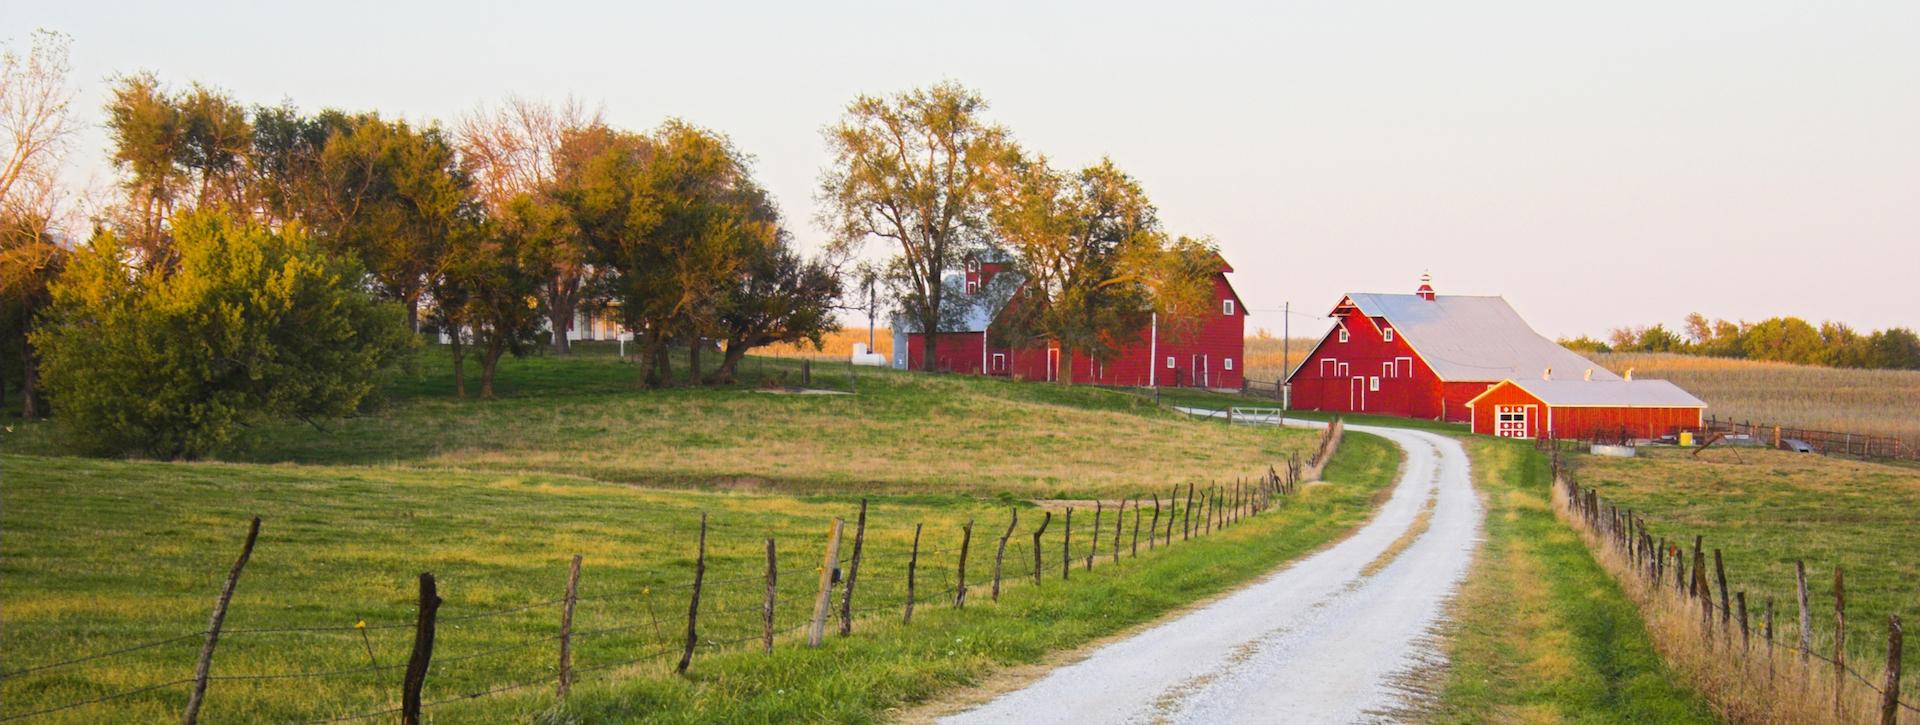 Farm Awards Pioneer - Aksarben Foundation